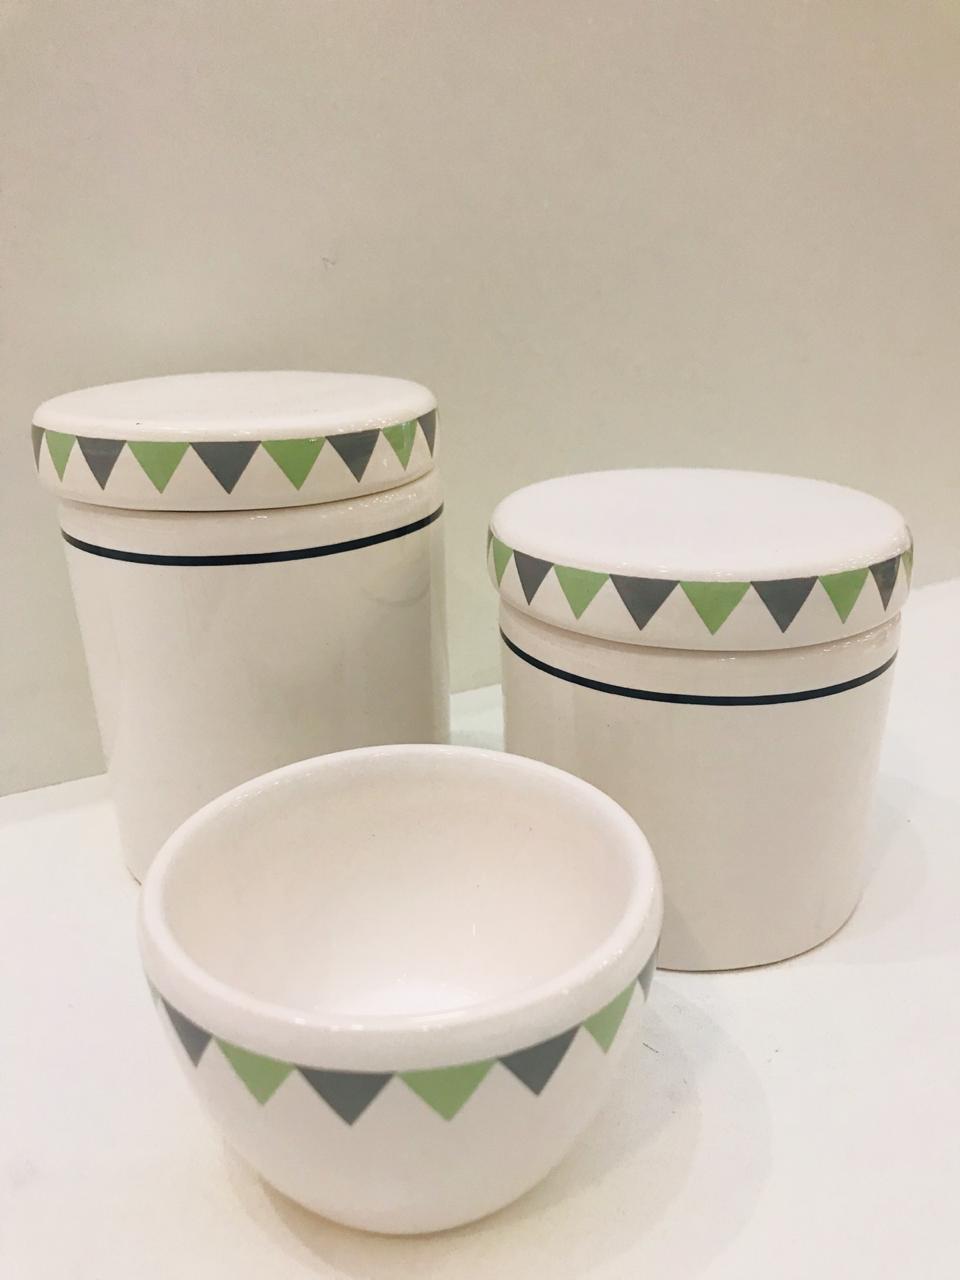 Kit Porcelana Branco Com Tampa Triângulos Verde e Cinza 3 PÇS - Rossi Niero